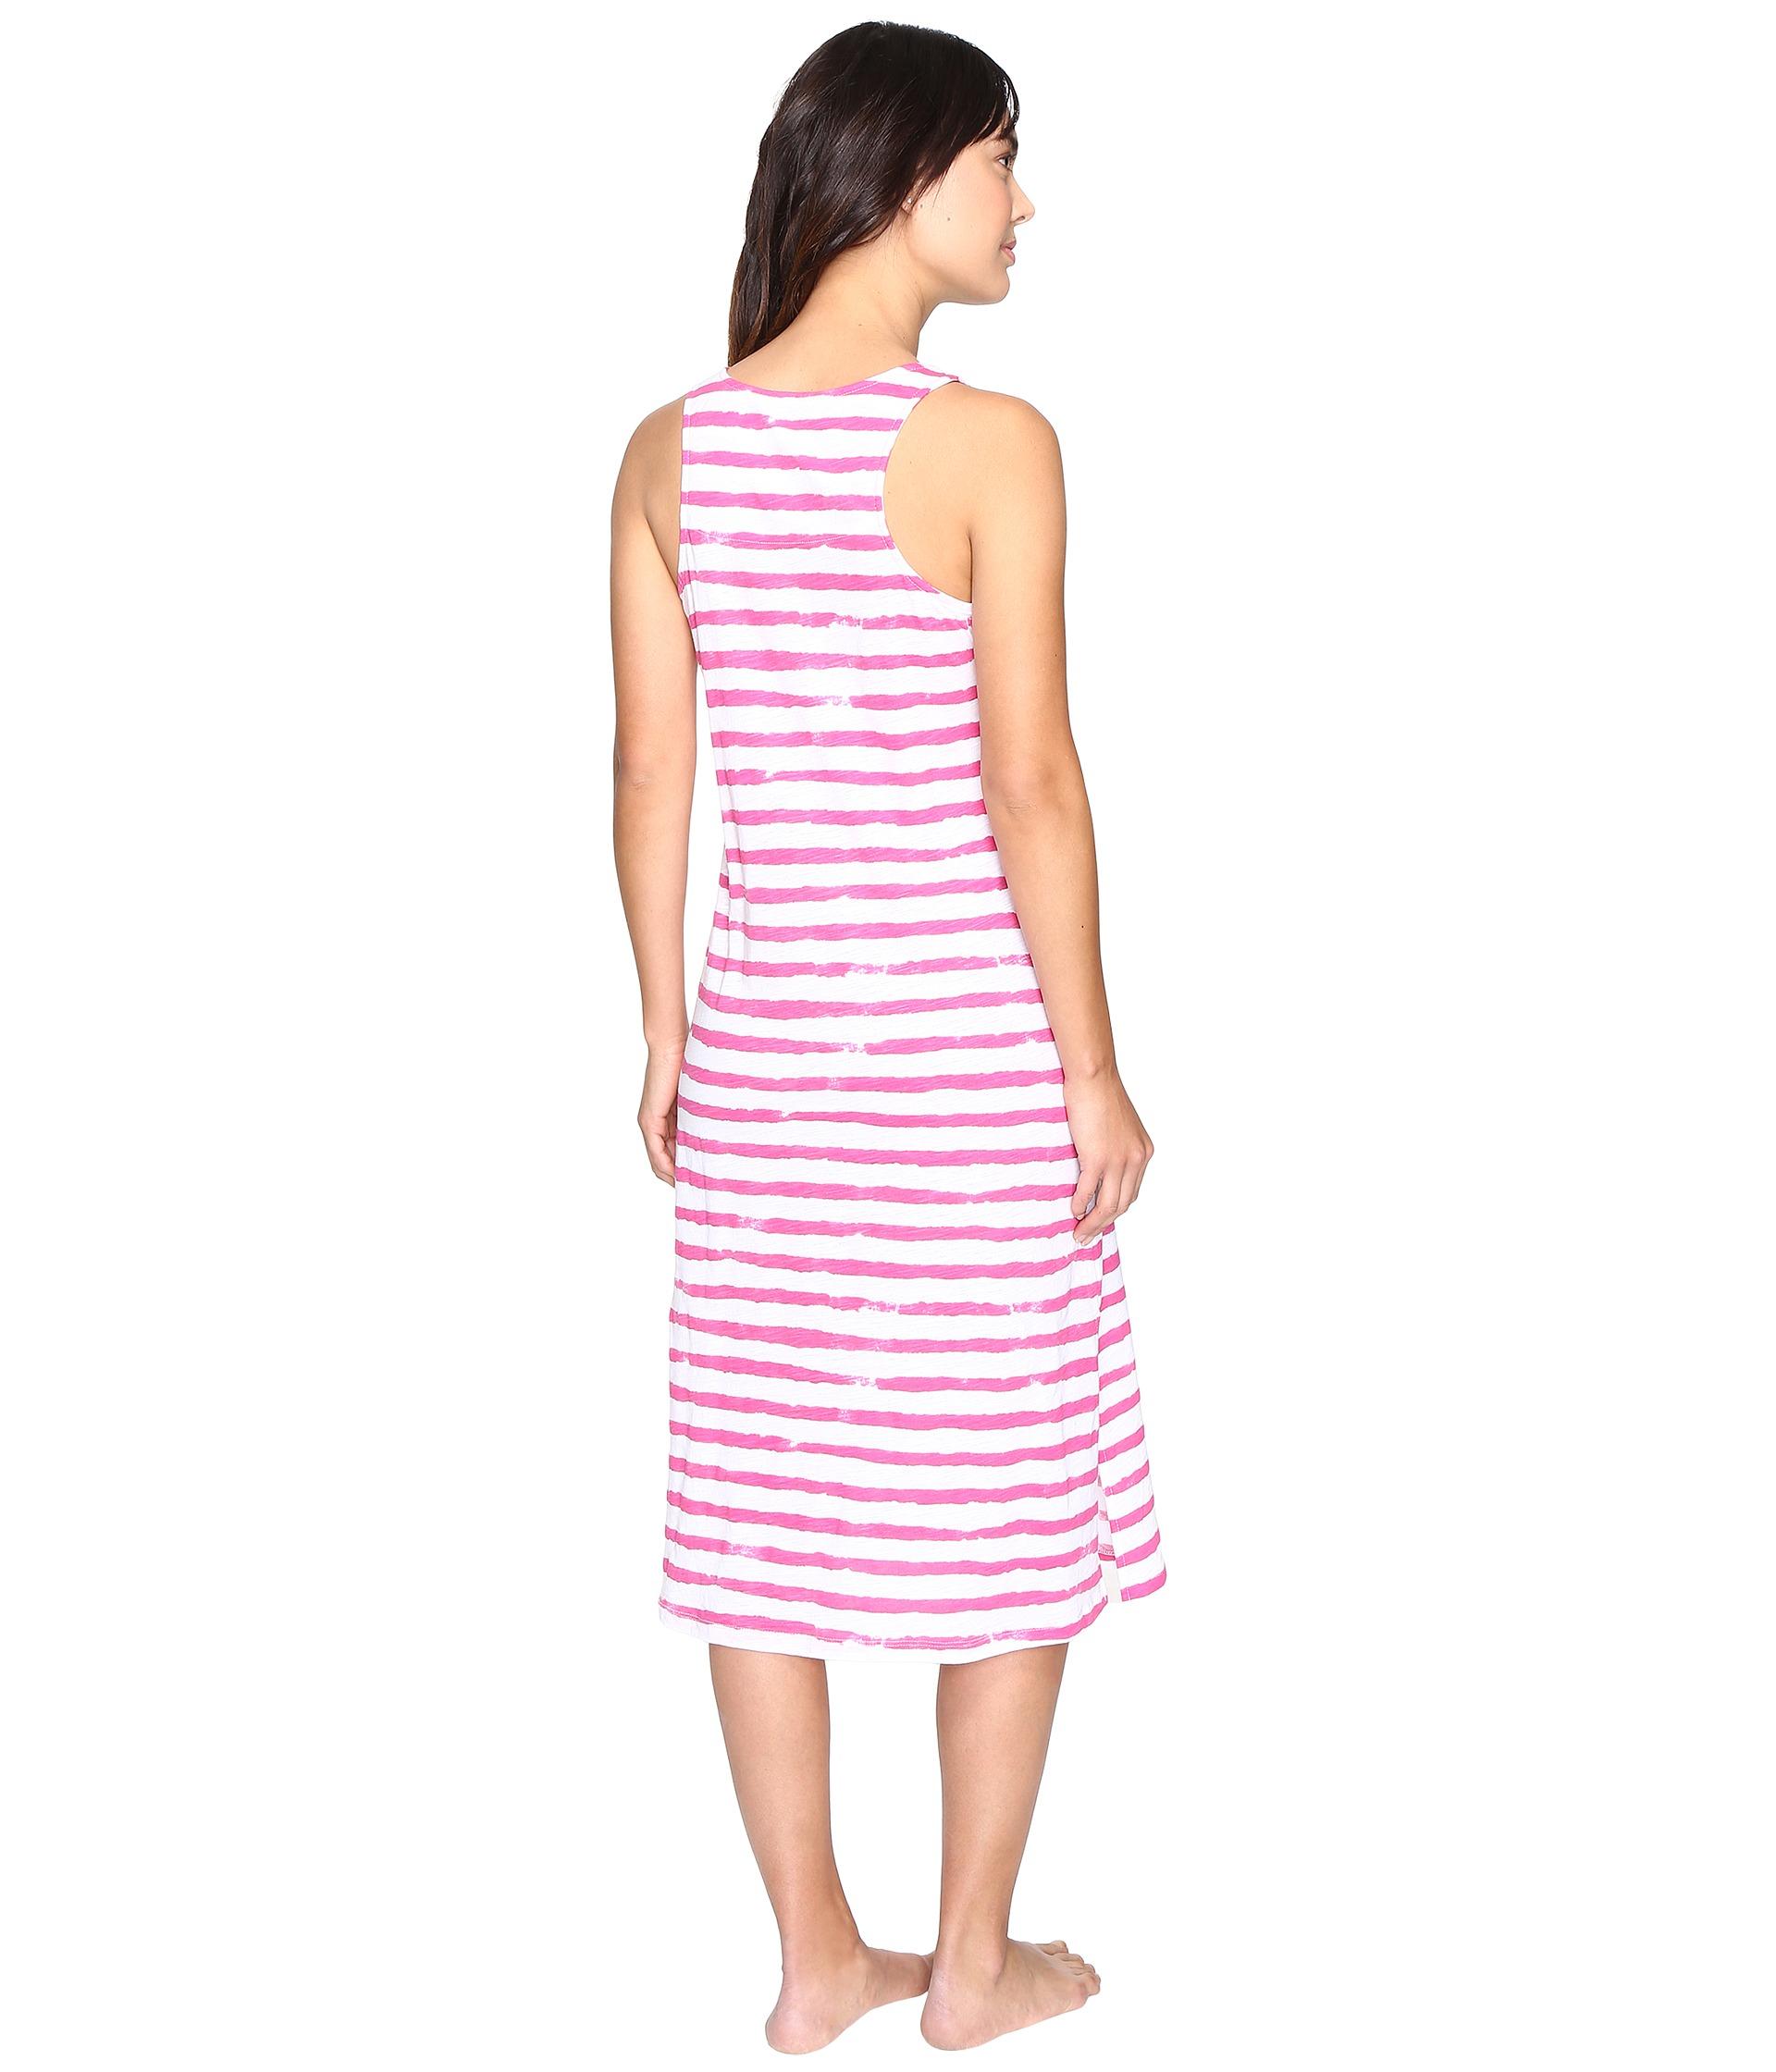 lauren ralph lauren jersey knit ballet gown stripe pink white free shipping both ways. Black Bedroom Furniture Sets. Home Design Ideas